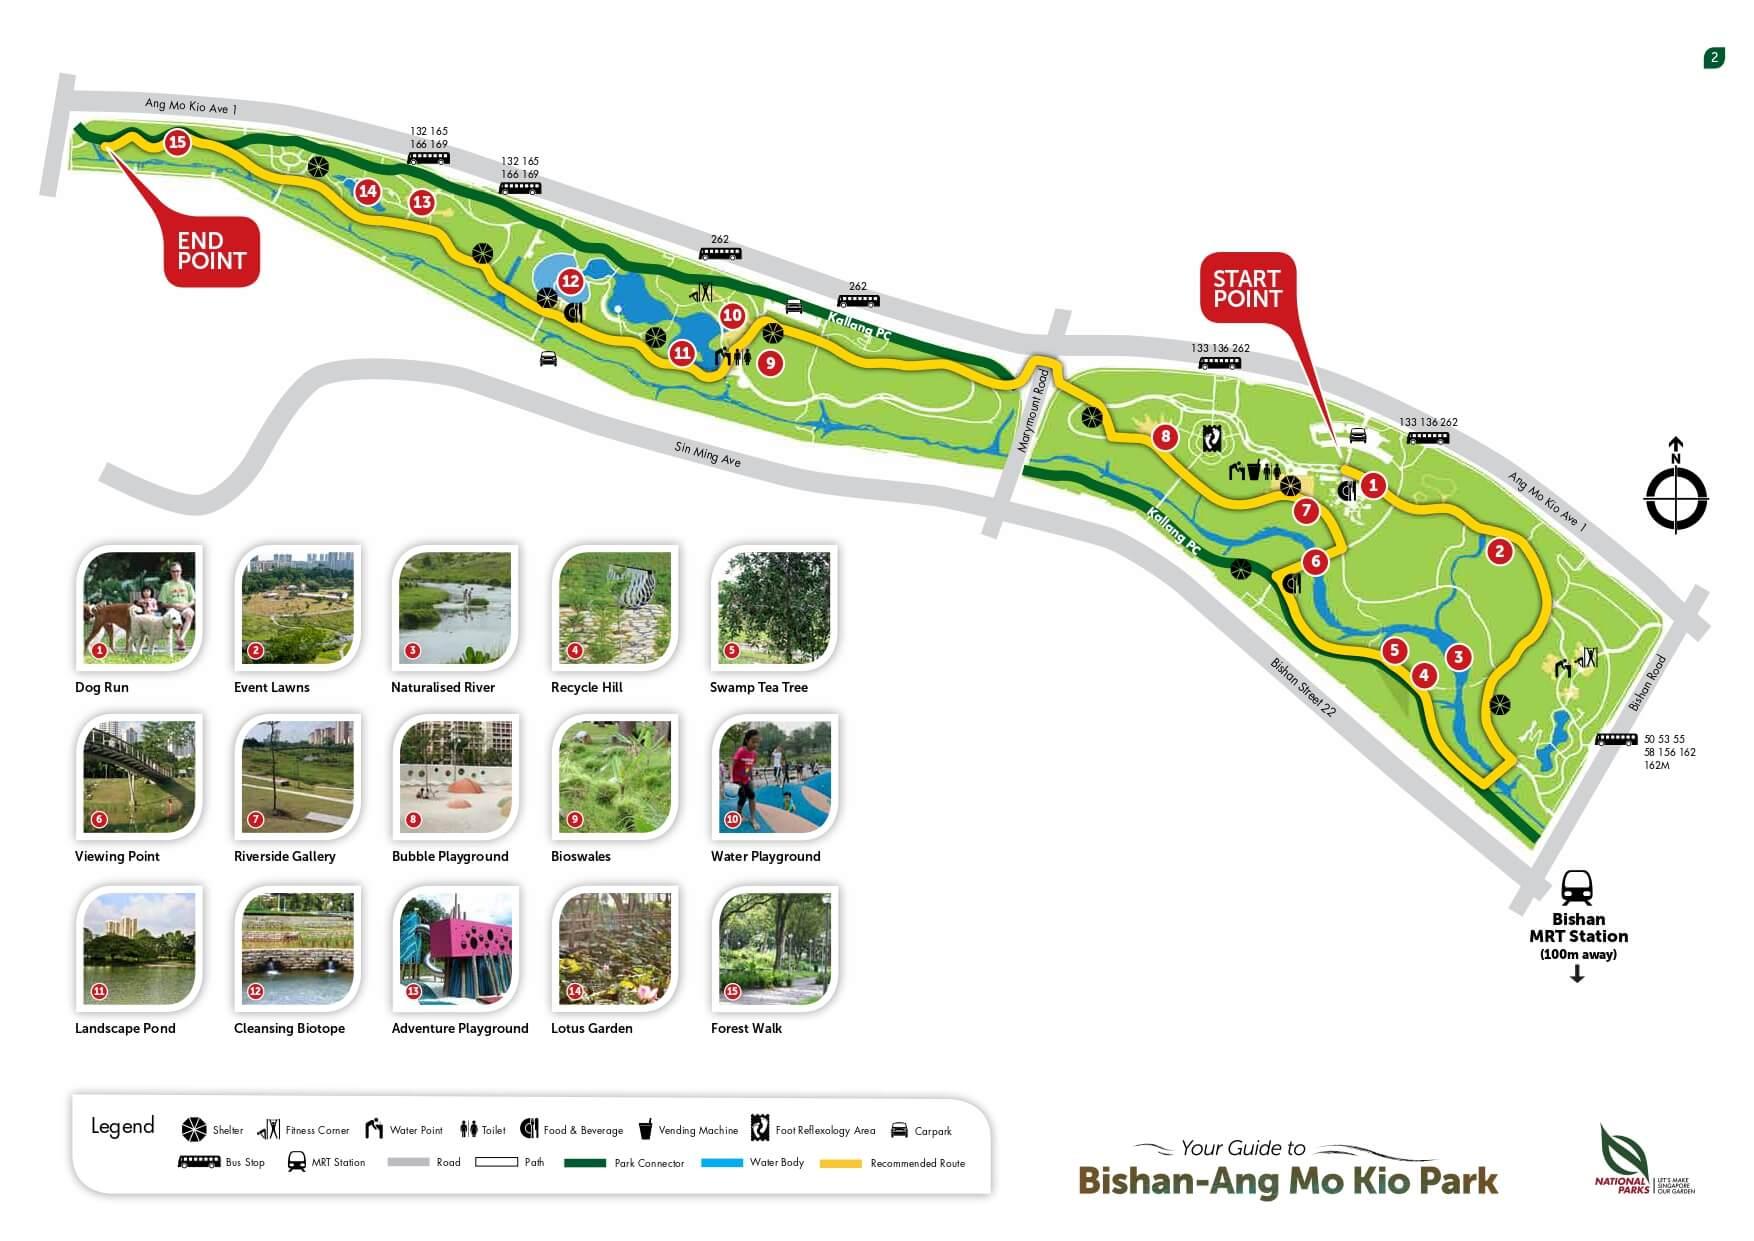 bishan amk park page 2